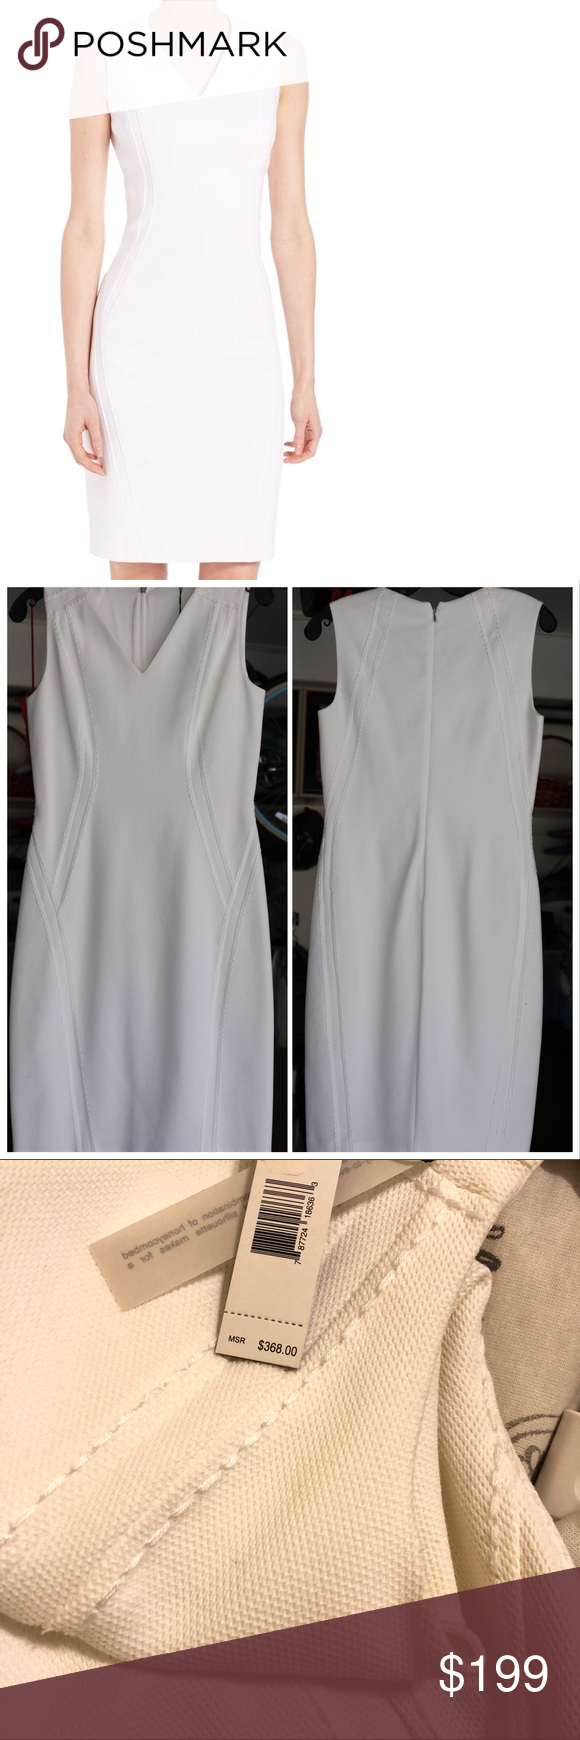 Elie Tahari Shannon Dress In White Flattering Sheath In Stretch Cotton Pique V Neck Sleeveless Back Zip Lined Elie Tahari Dresses Clothes Design White Dress [ 1740 x 580 Pixel ]